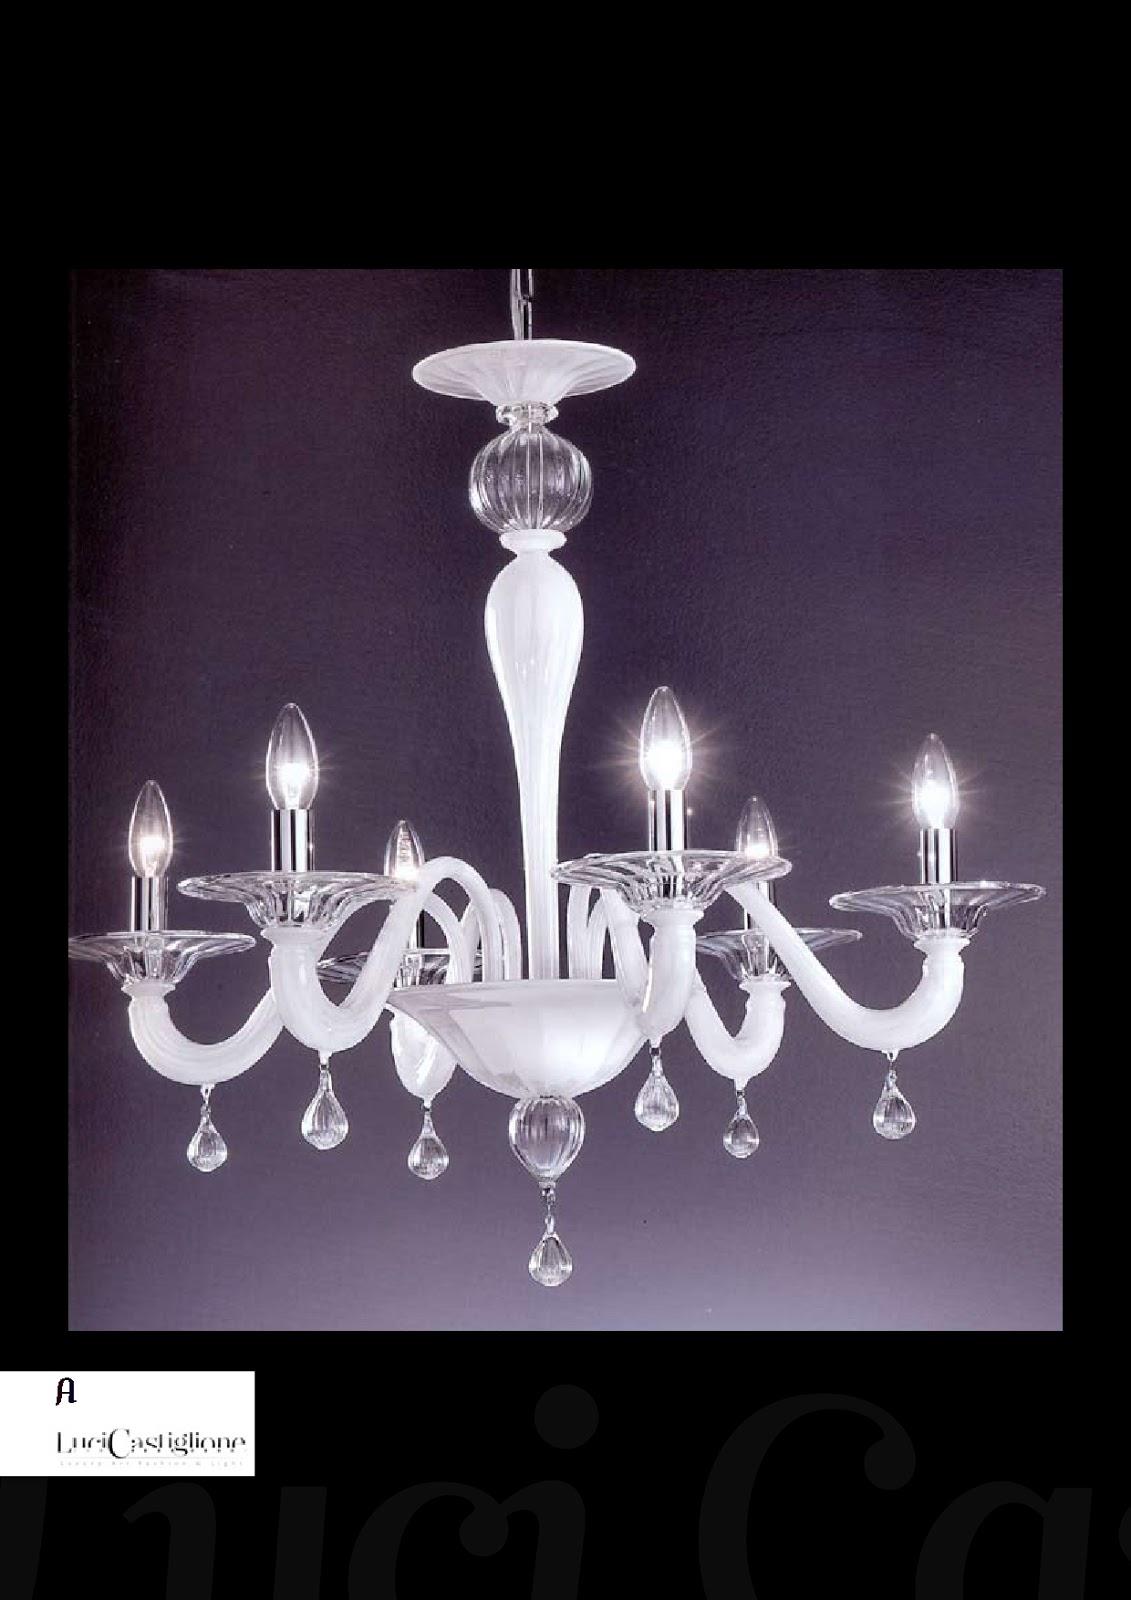 Lampadari in vetro di murano 485 lampadario di murano for Mondo convenienza lampadari moderni